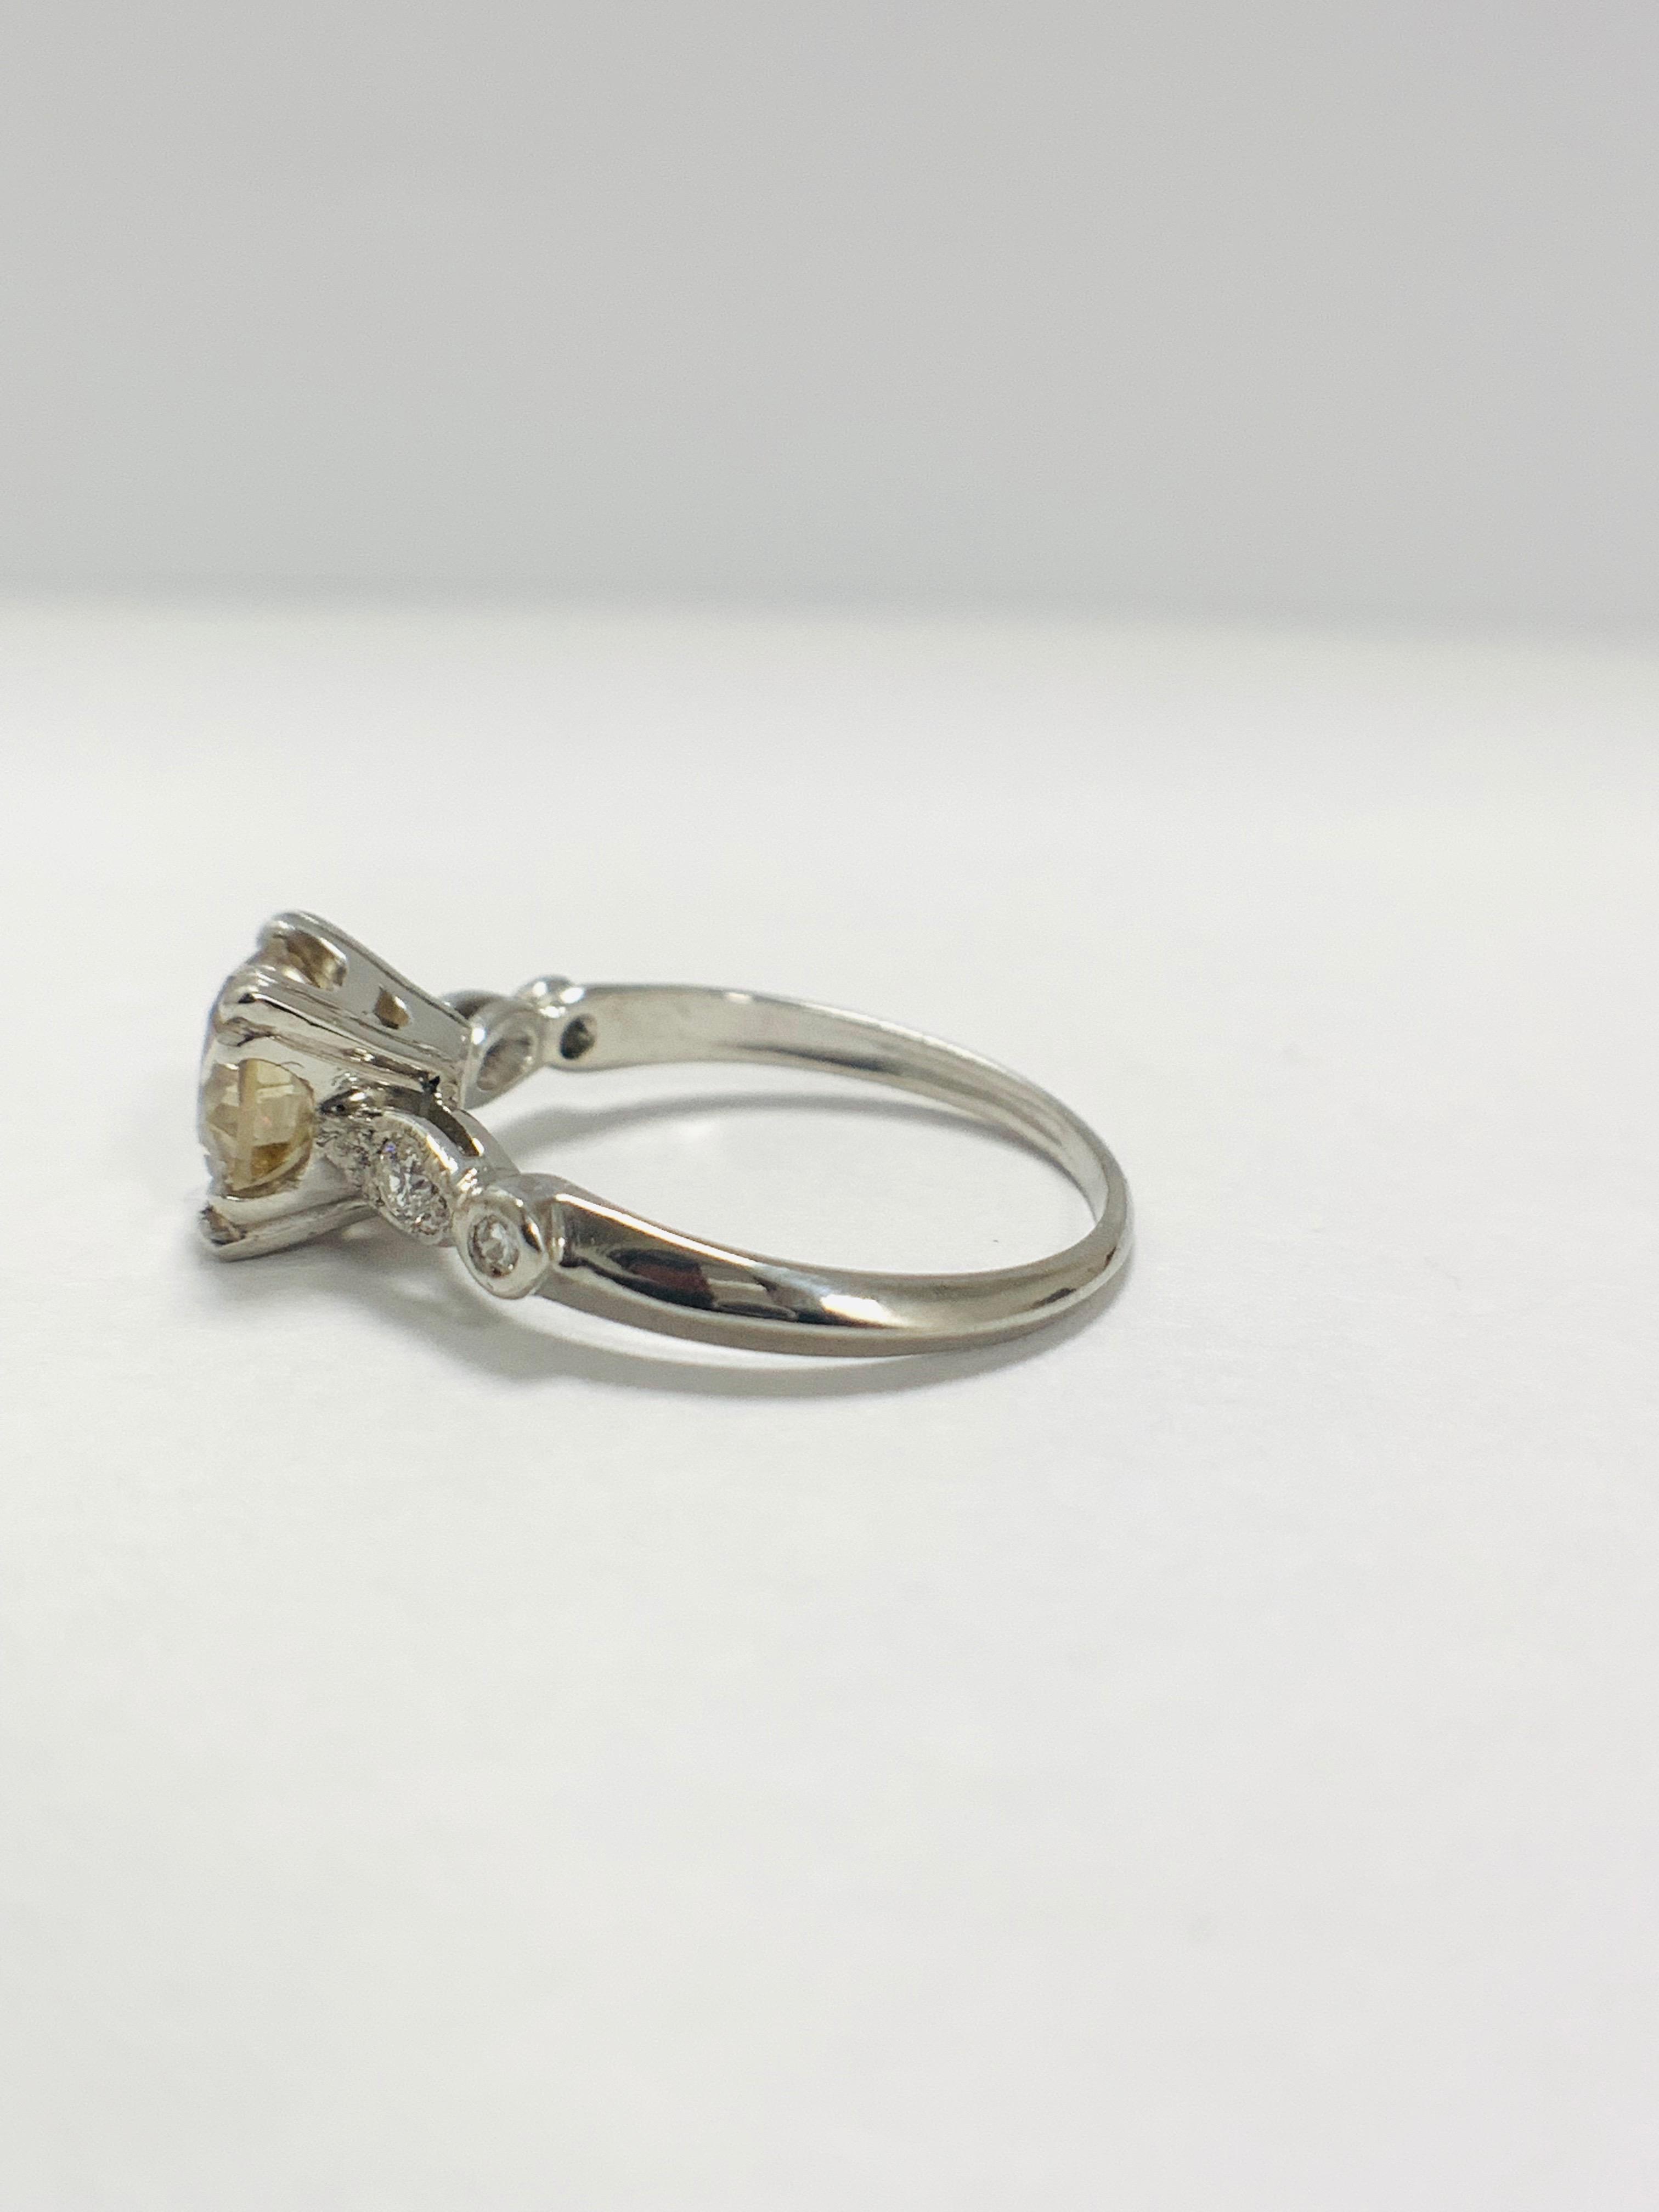 Platinum Diamond ring featuring centre, round brilliant cut, fancy light brown Diamond (1.55ct) - Image 3 of 14